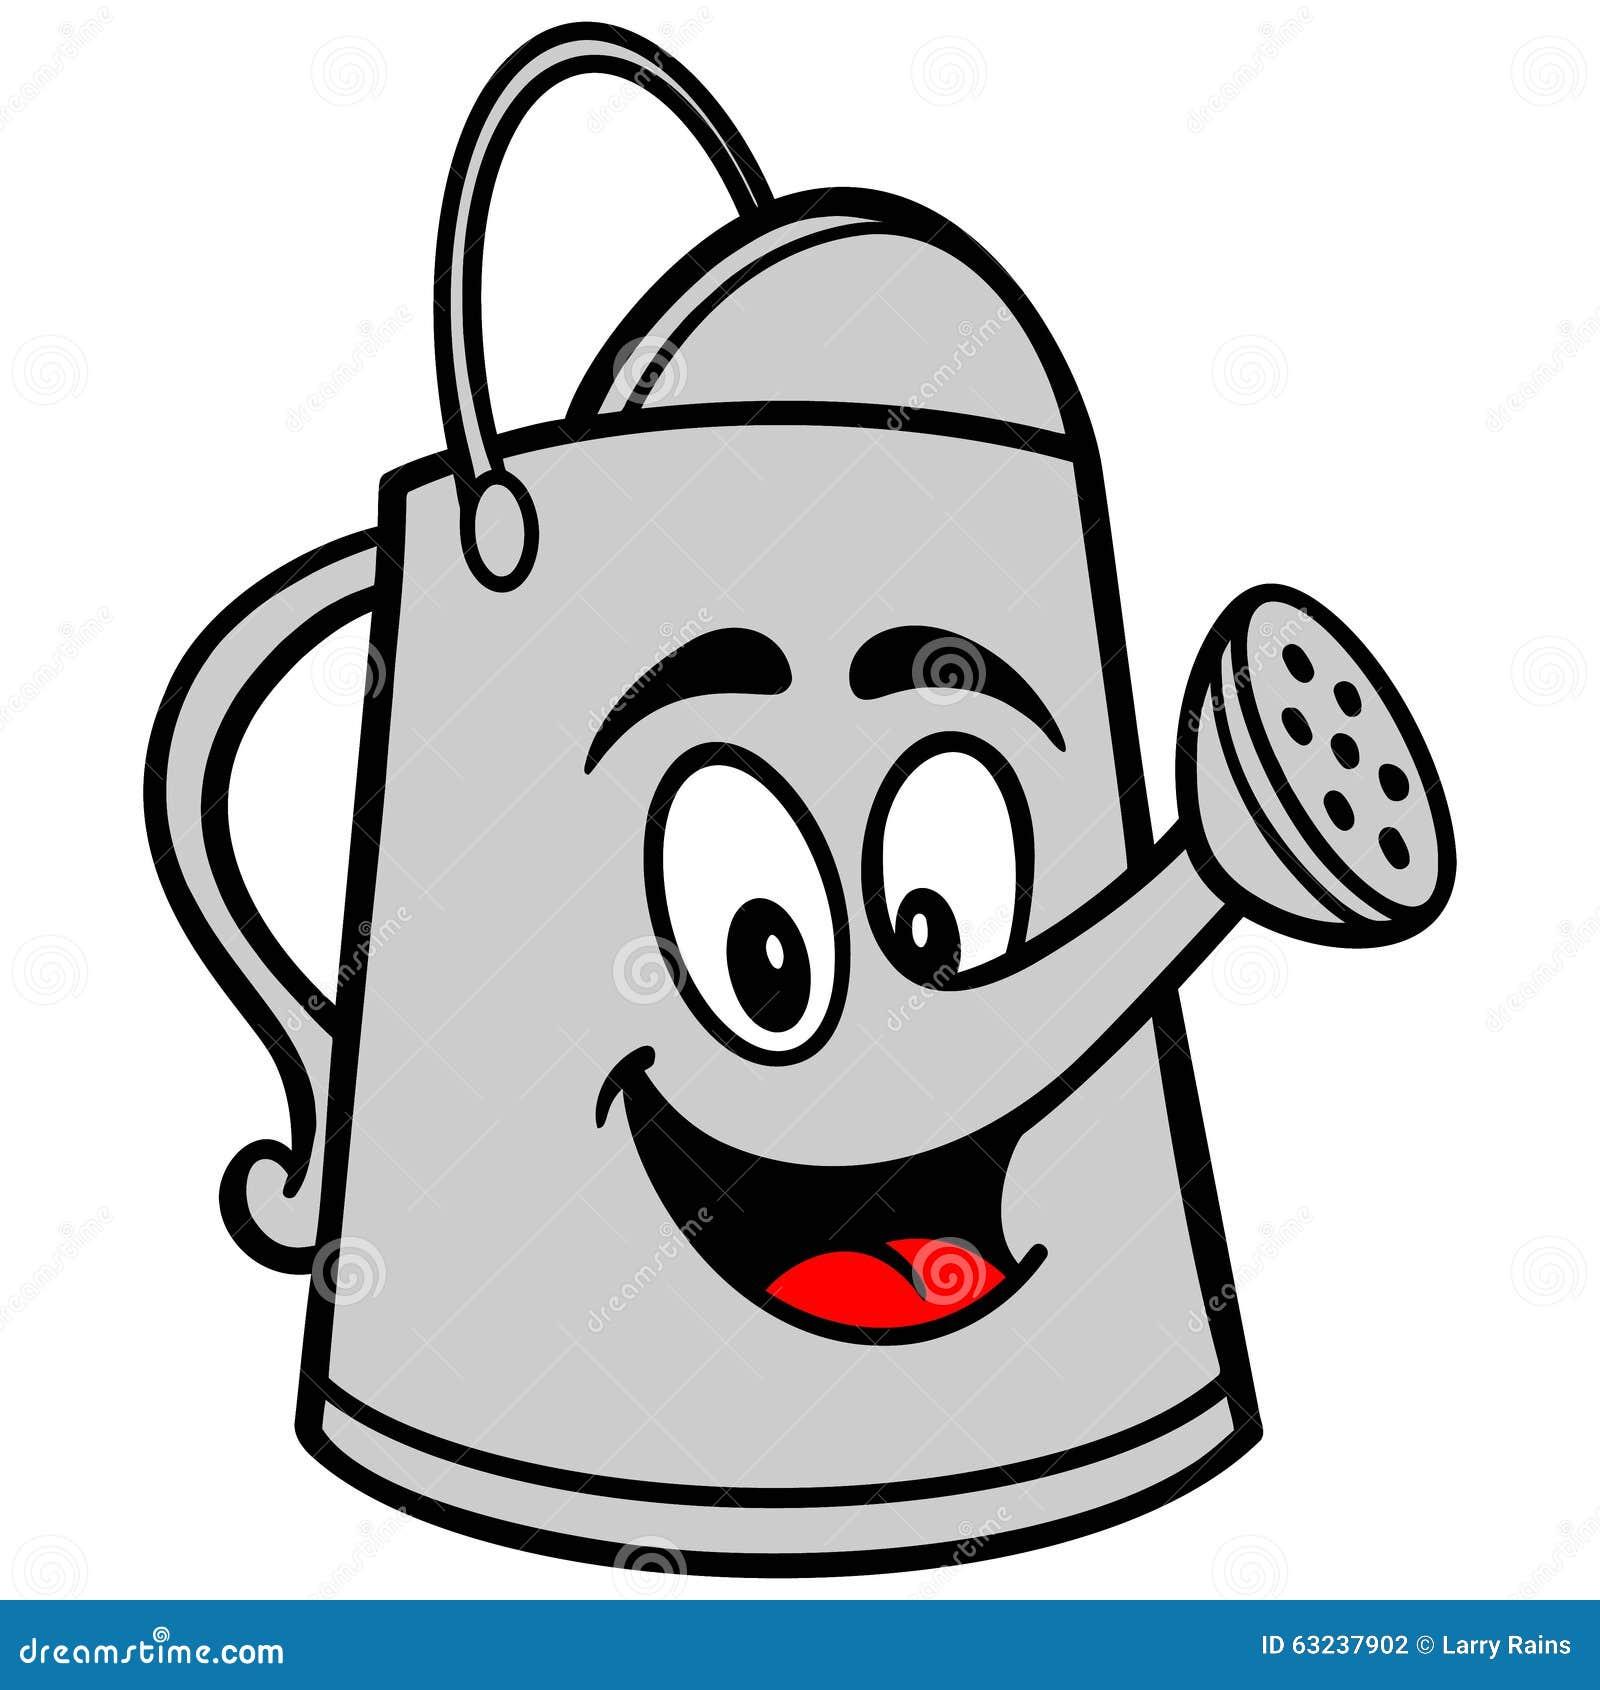 Watering Can Cartoon Stock Vector - Image: 63237902